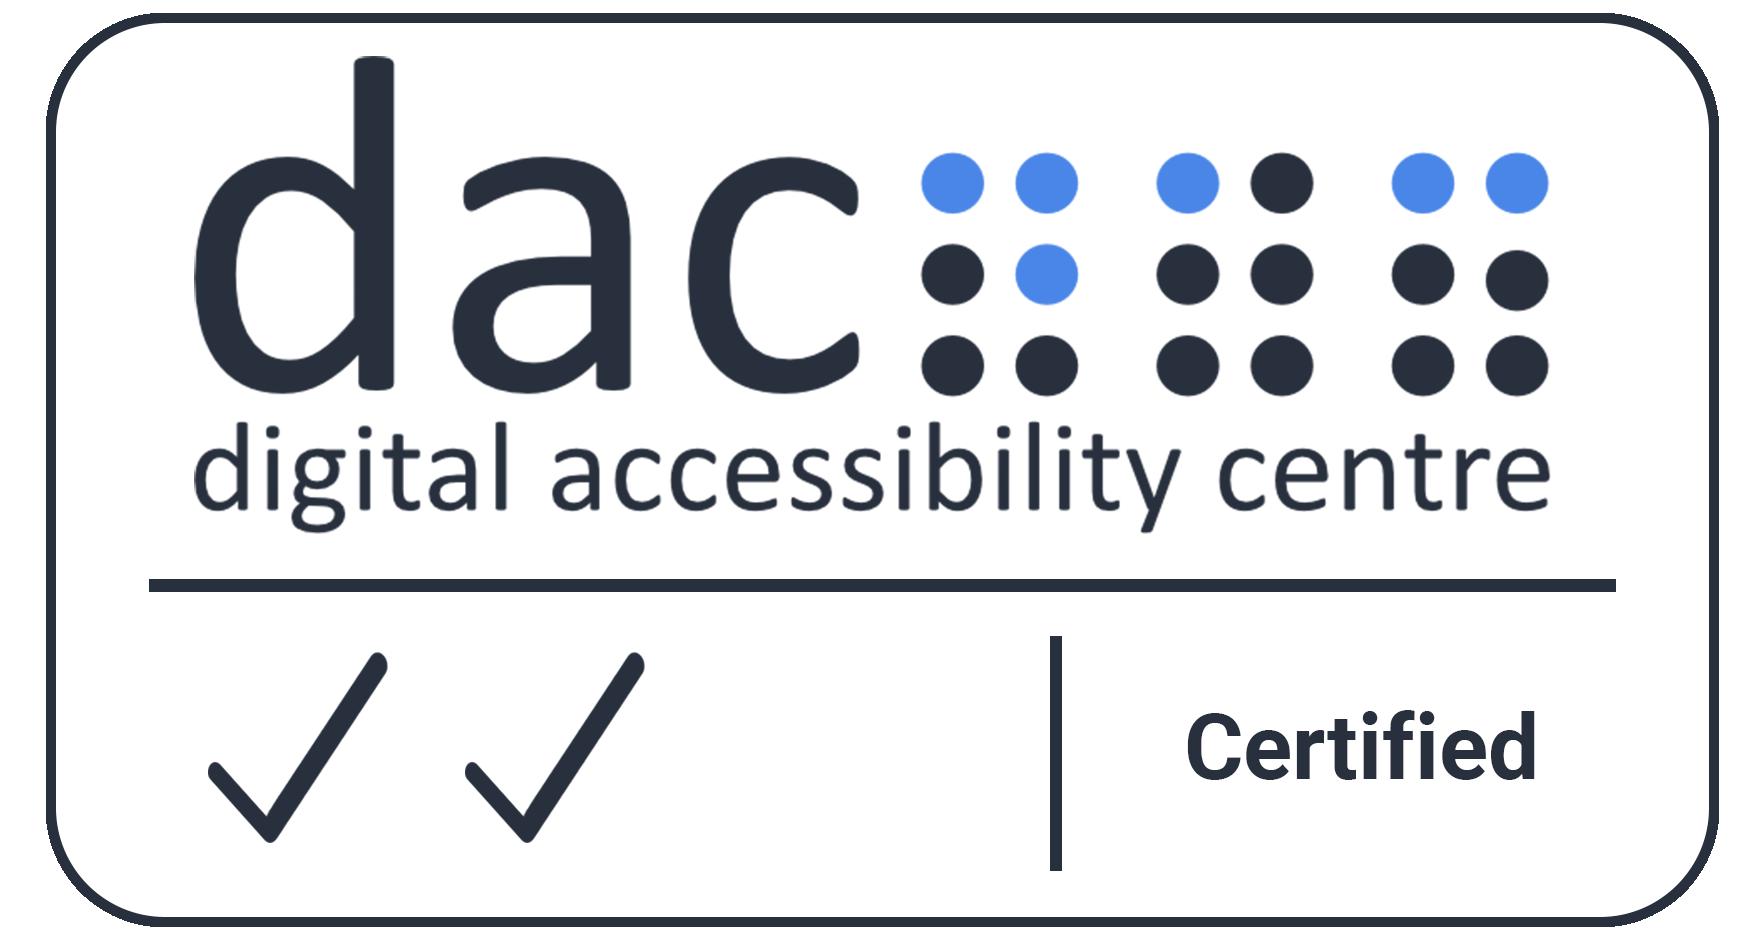 Digital Accessibility Centre Accreditation Certificate